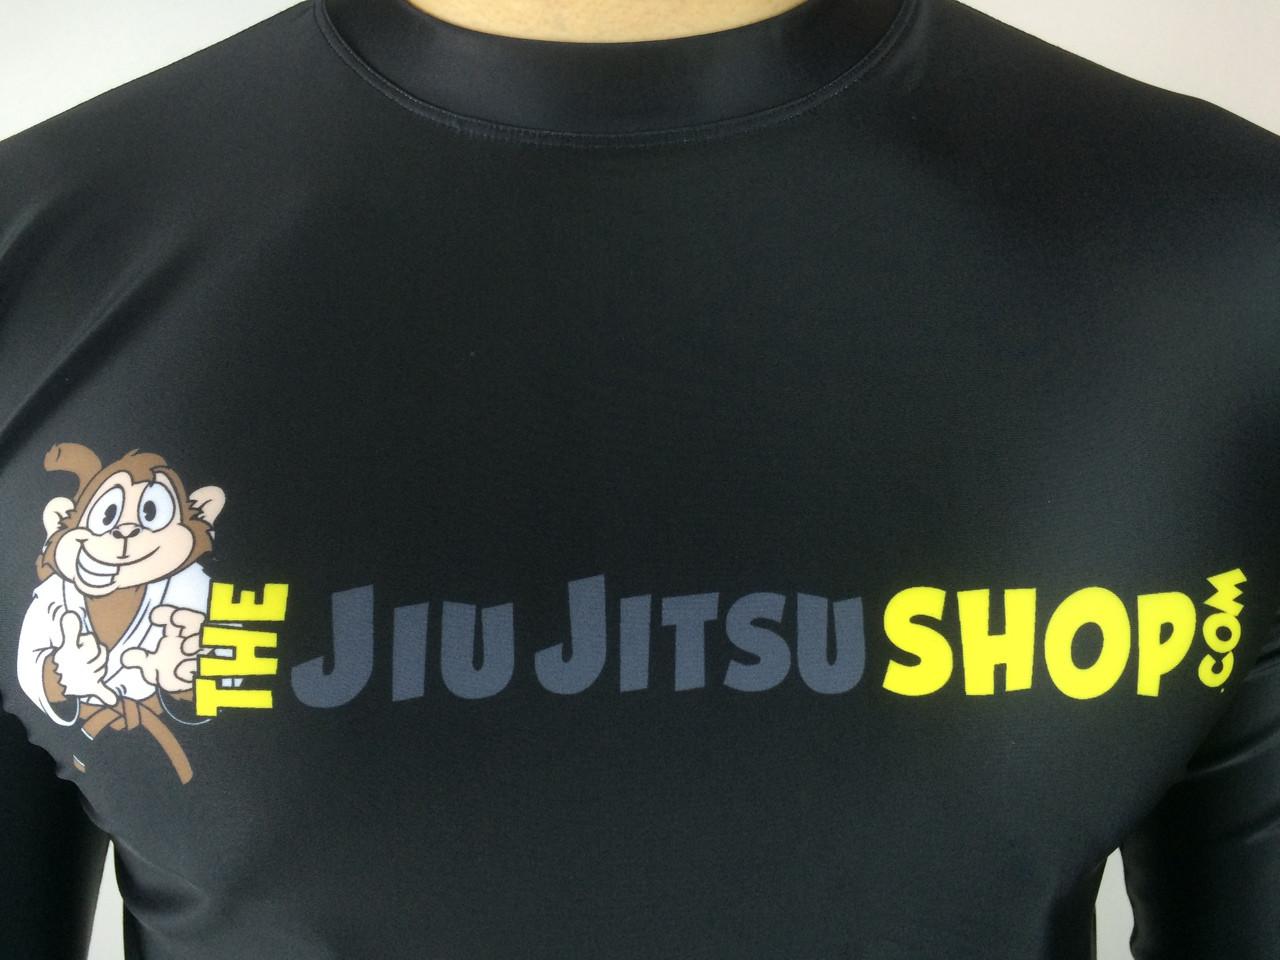 "The Jiu Jitsu Shop's ""Essentials"" Long-Sleeve Rashguard, featuring our buddy Rocky the Monkey. Exclusively at www.thejiujitsushop.com. Free domestic shipping storewide."